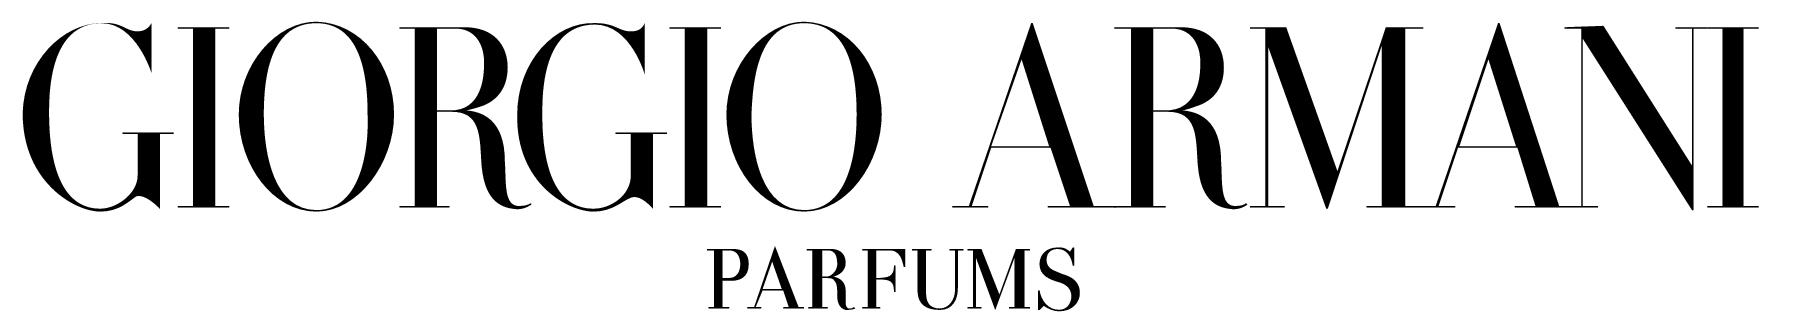 fichiergiorgio armani parfums logopng � wikip233dia